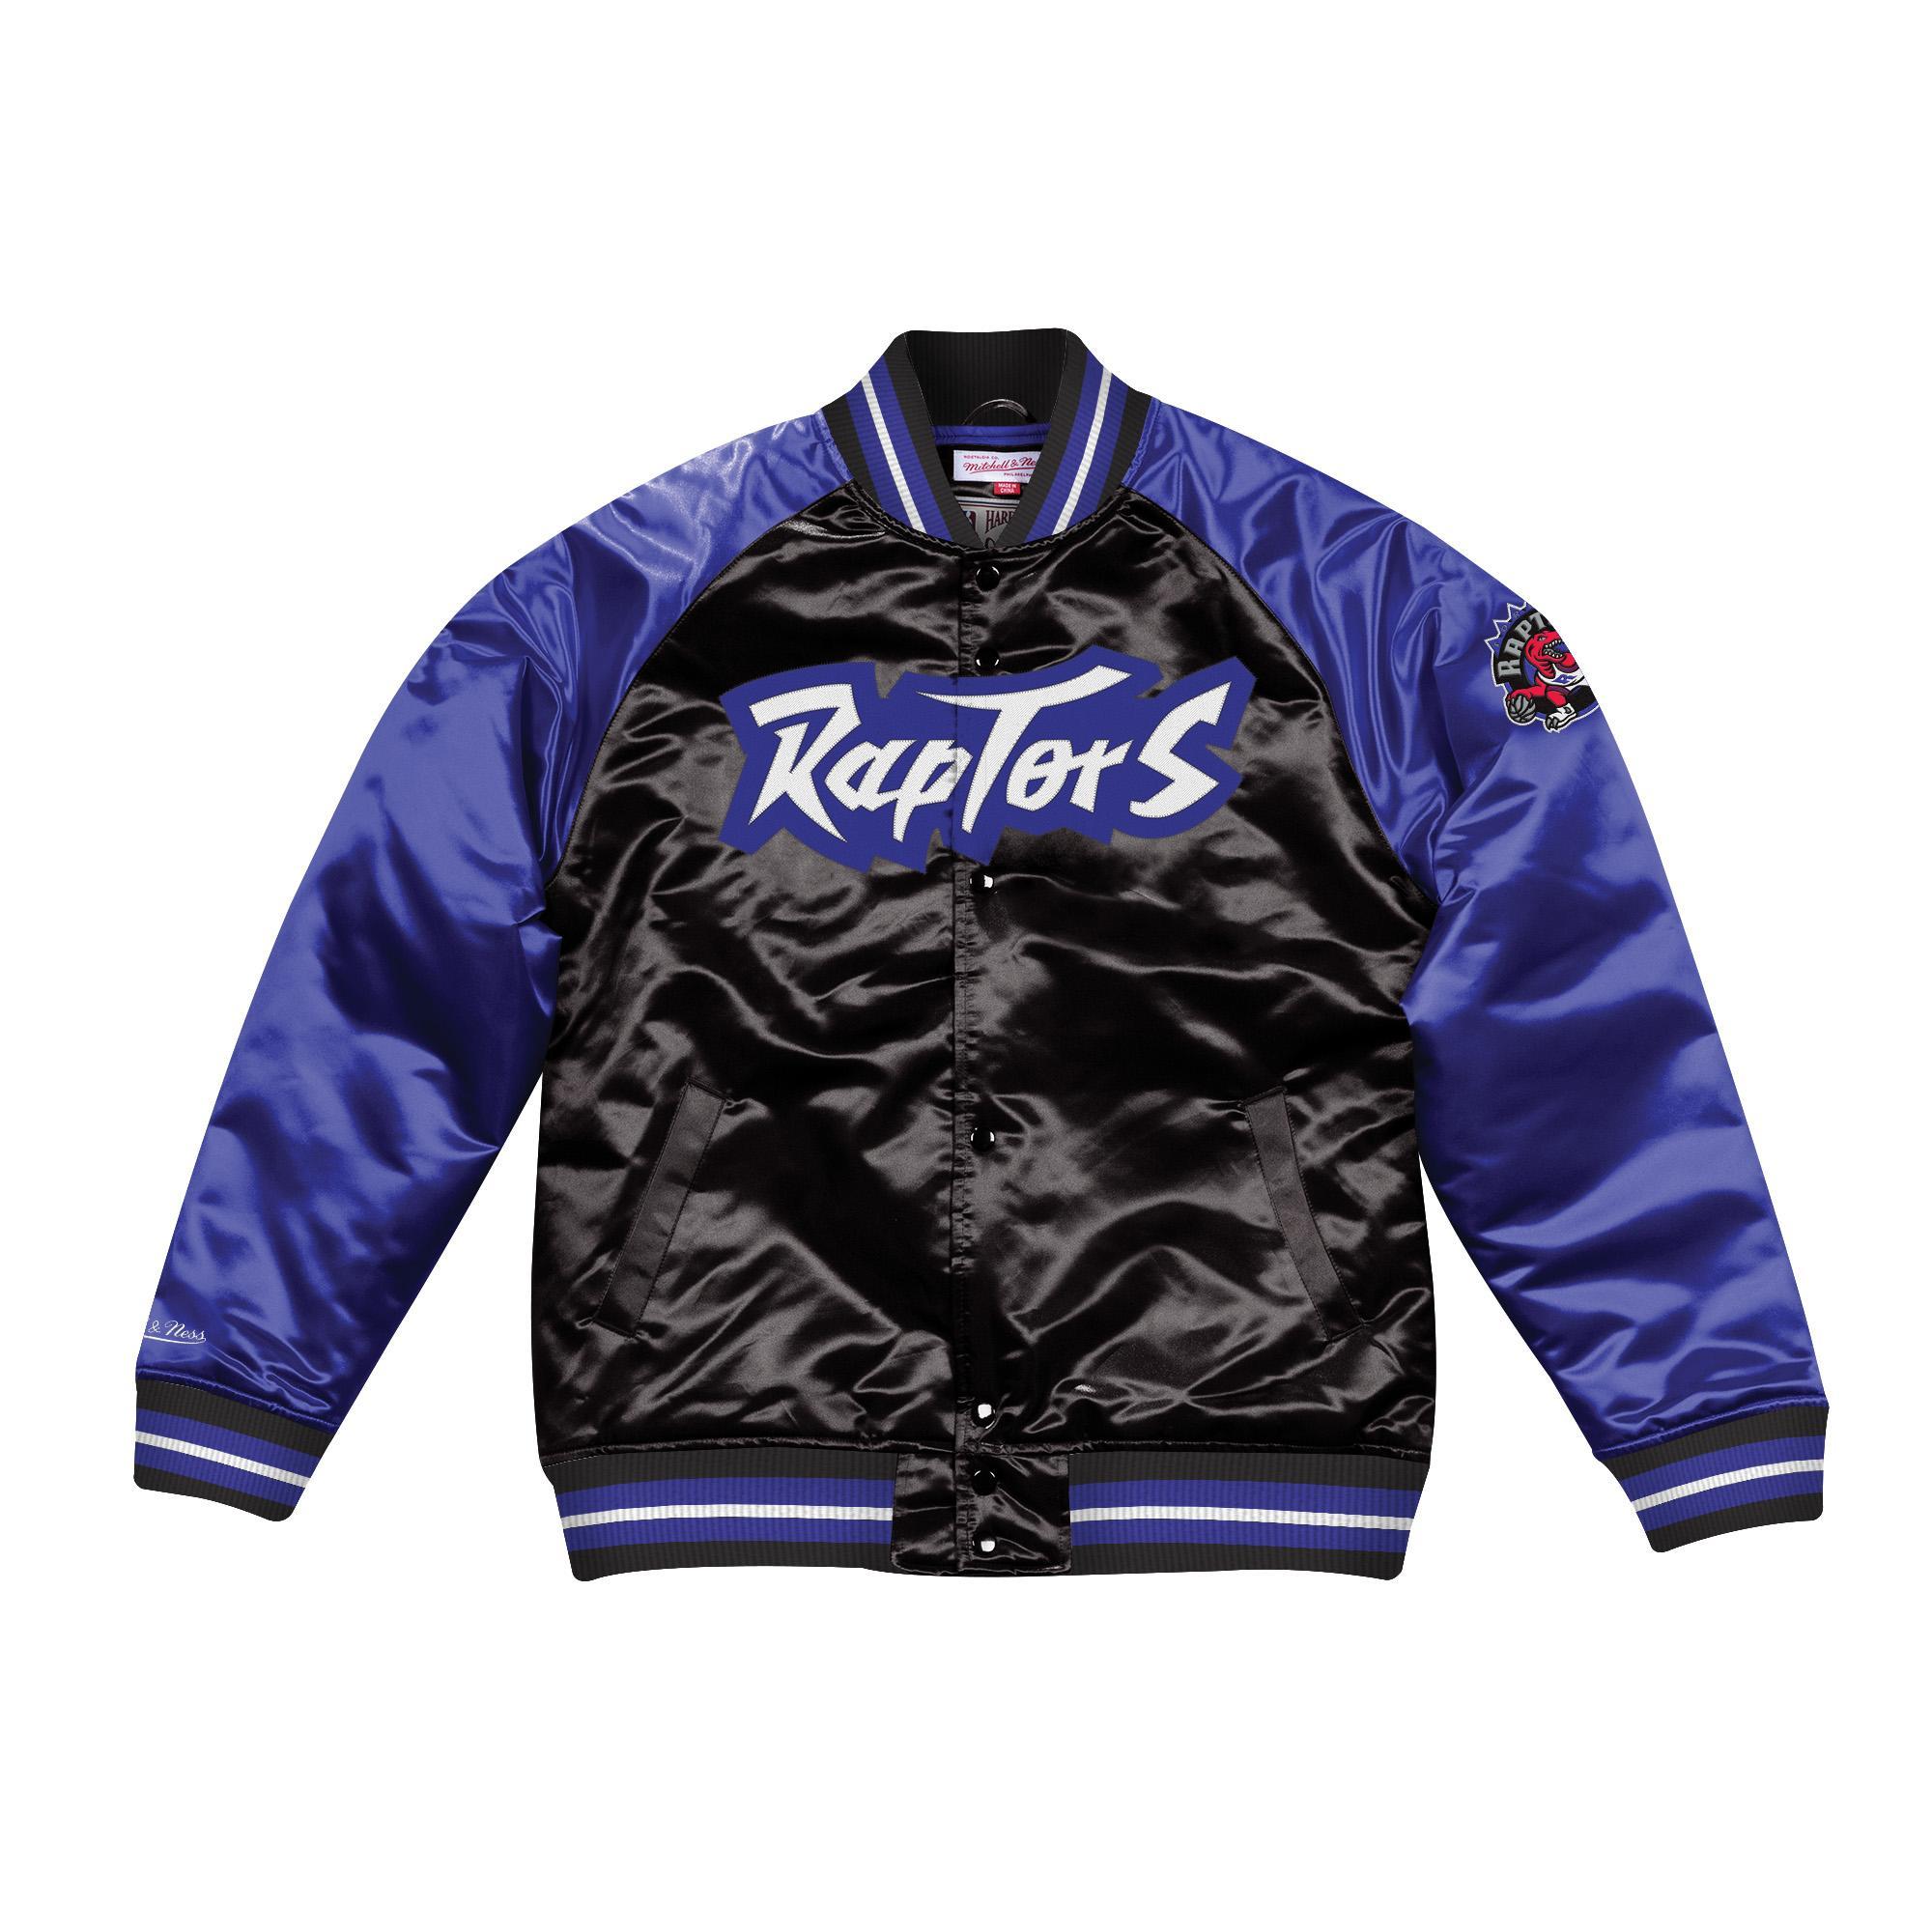 bb20812d Mitchell & Ness | Toronto Raptors Tough Season Satin Jacket